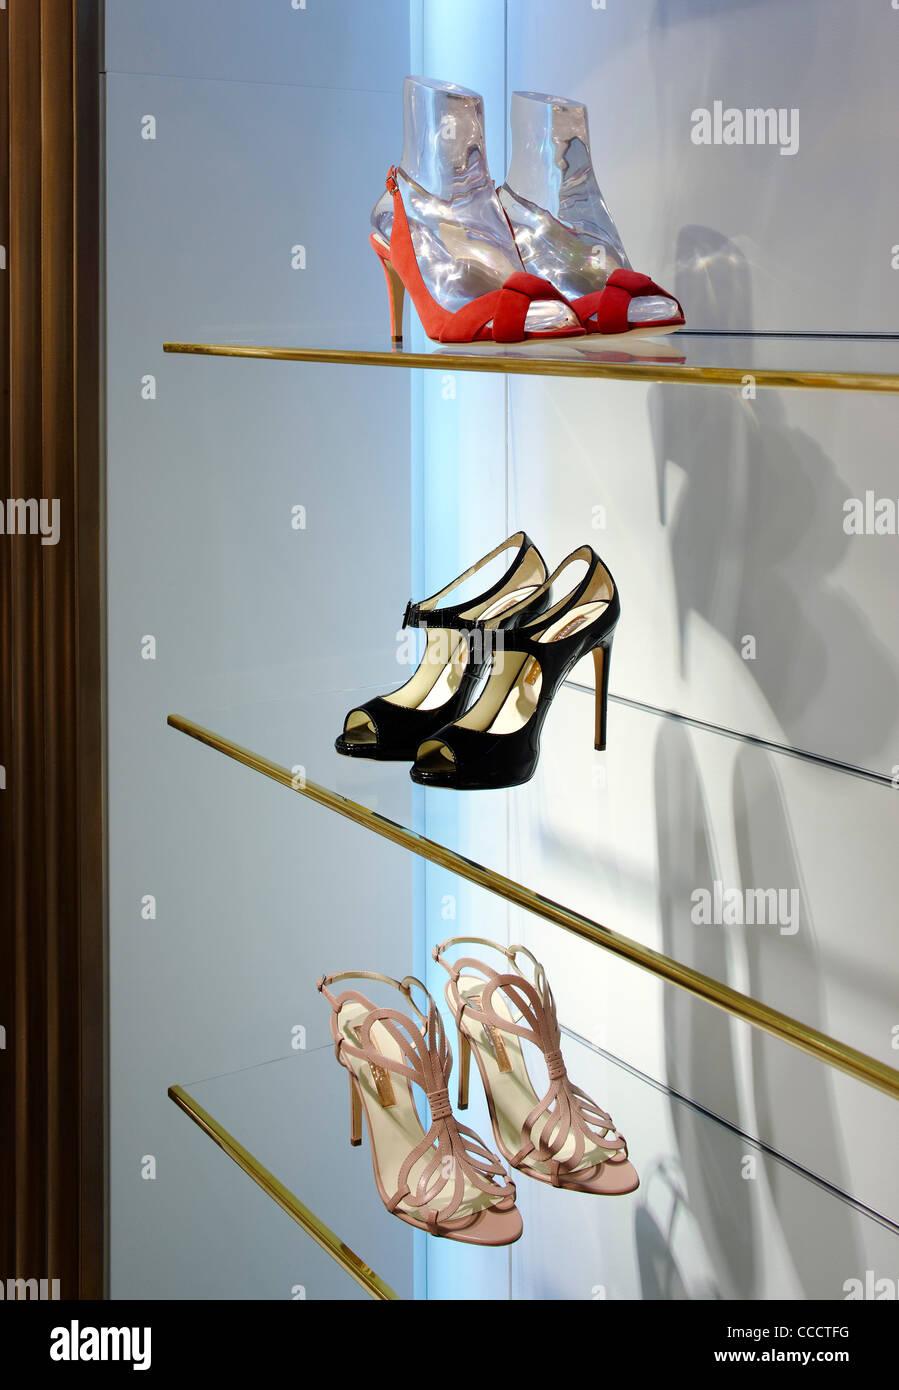 Japanese Hairdresser Covent Garden: Shoe Department London Stock Photos & Shoe Department